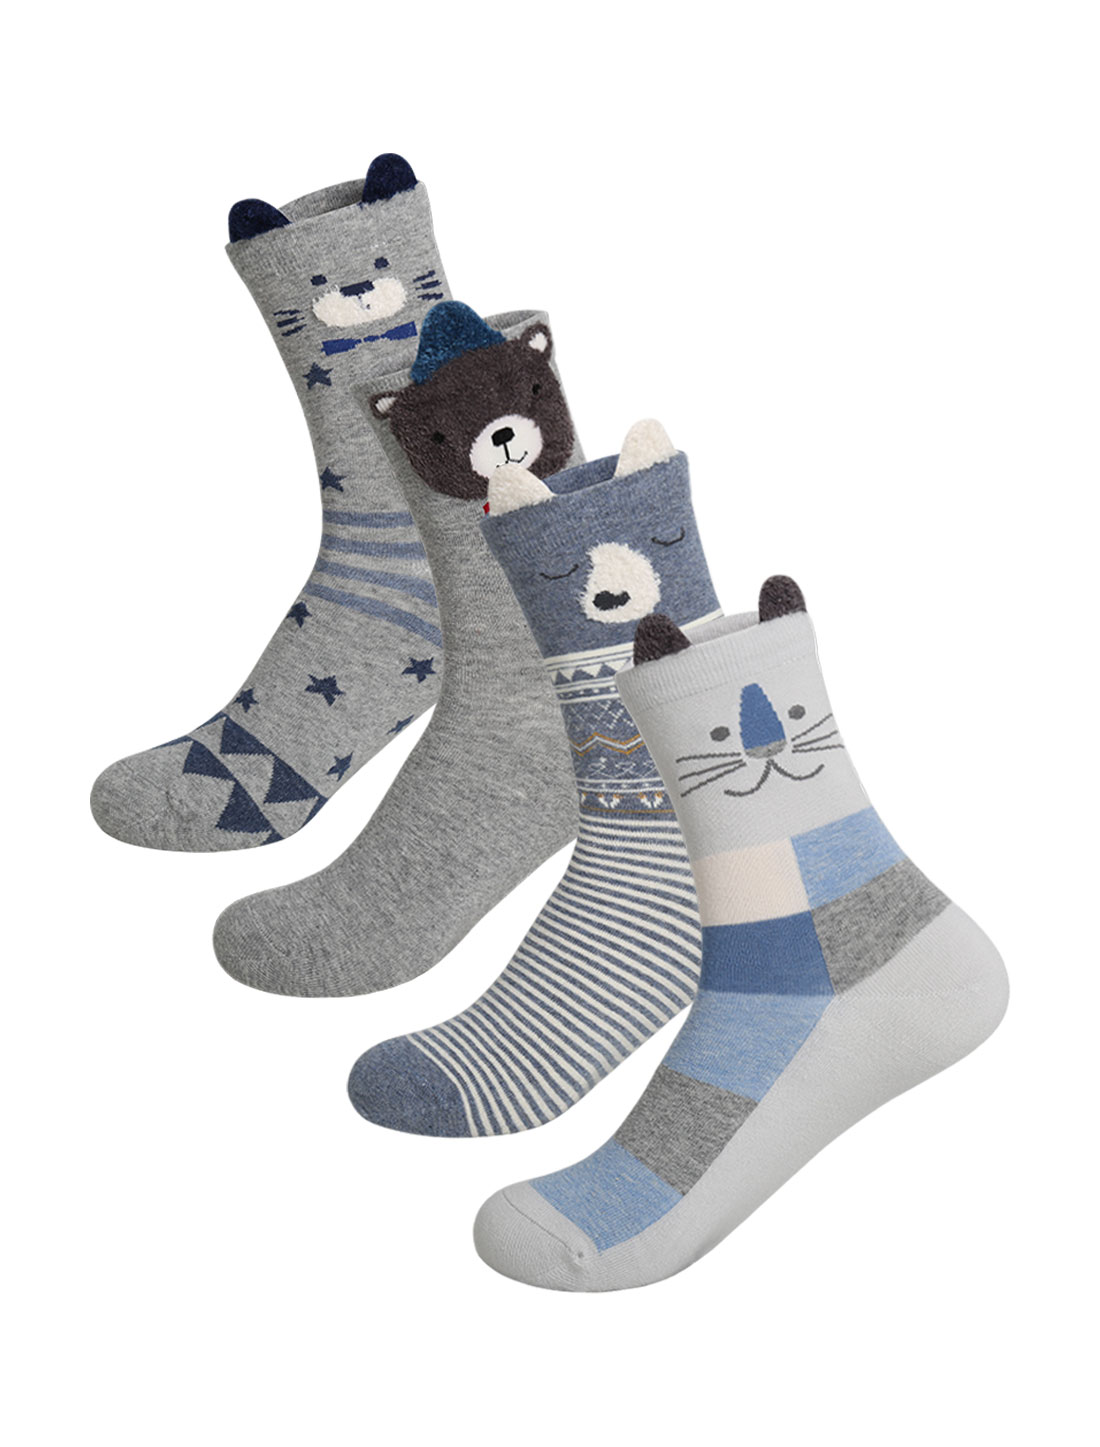 Women 4 pair Animal Stripes Stars Novelty Pattern Socks 9-11 Assorted-2